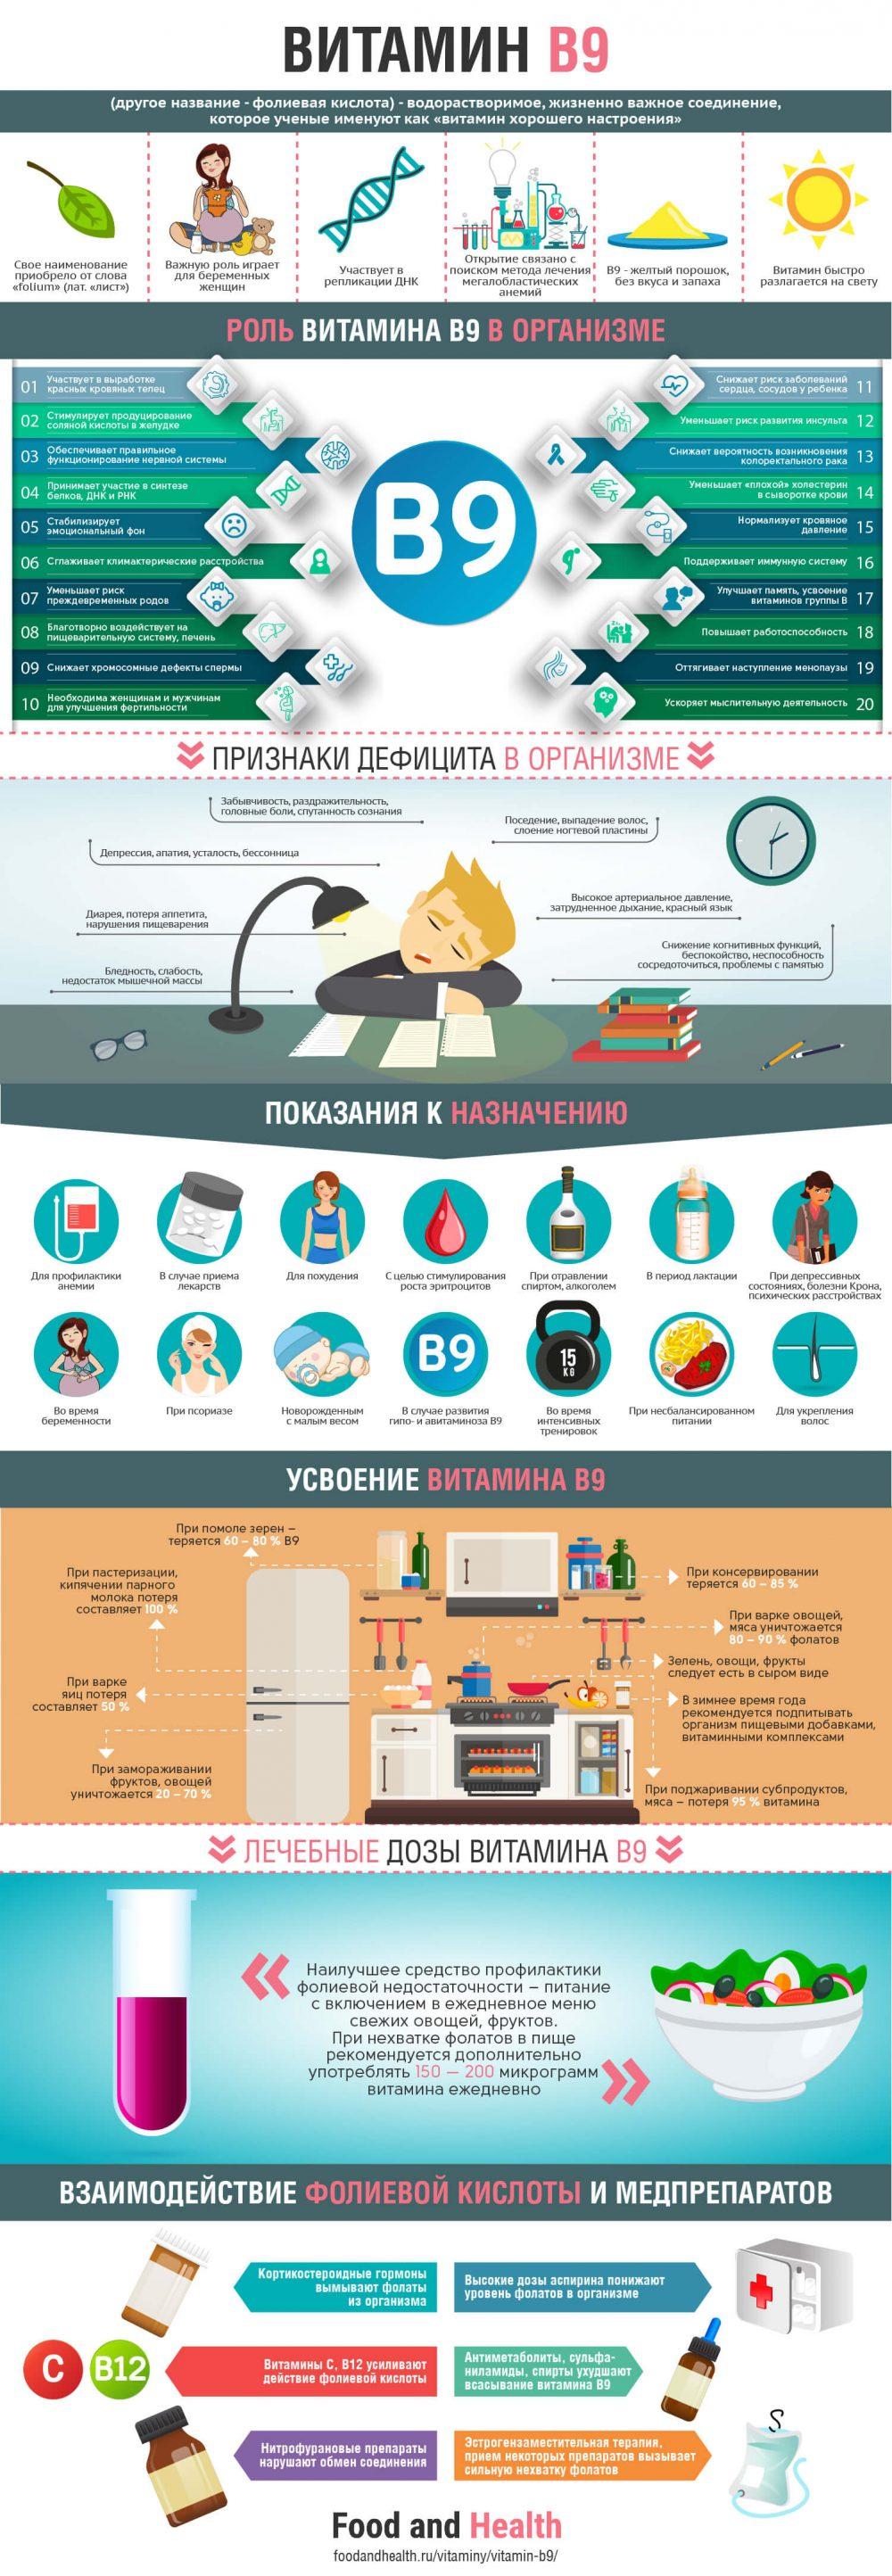 Витамин B9 - инфографика